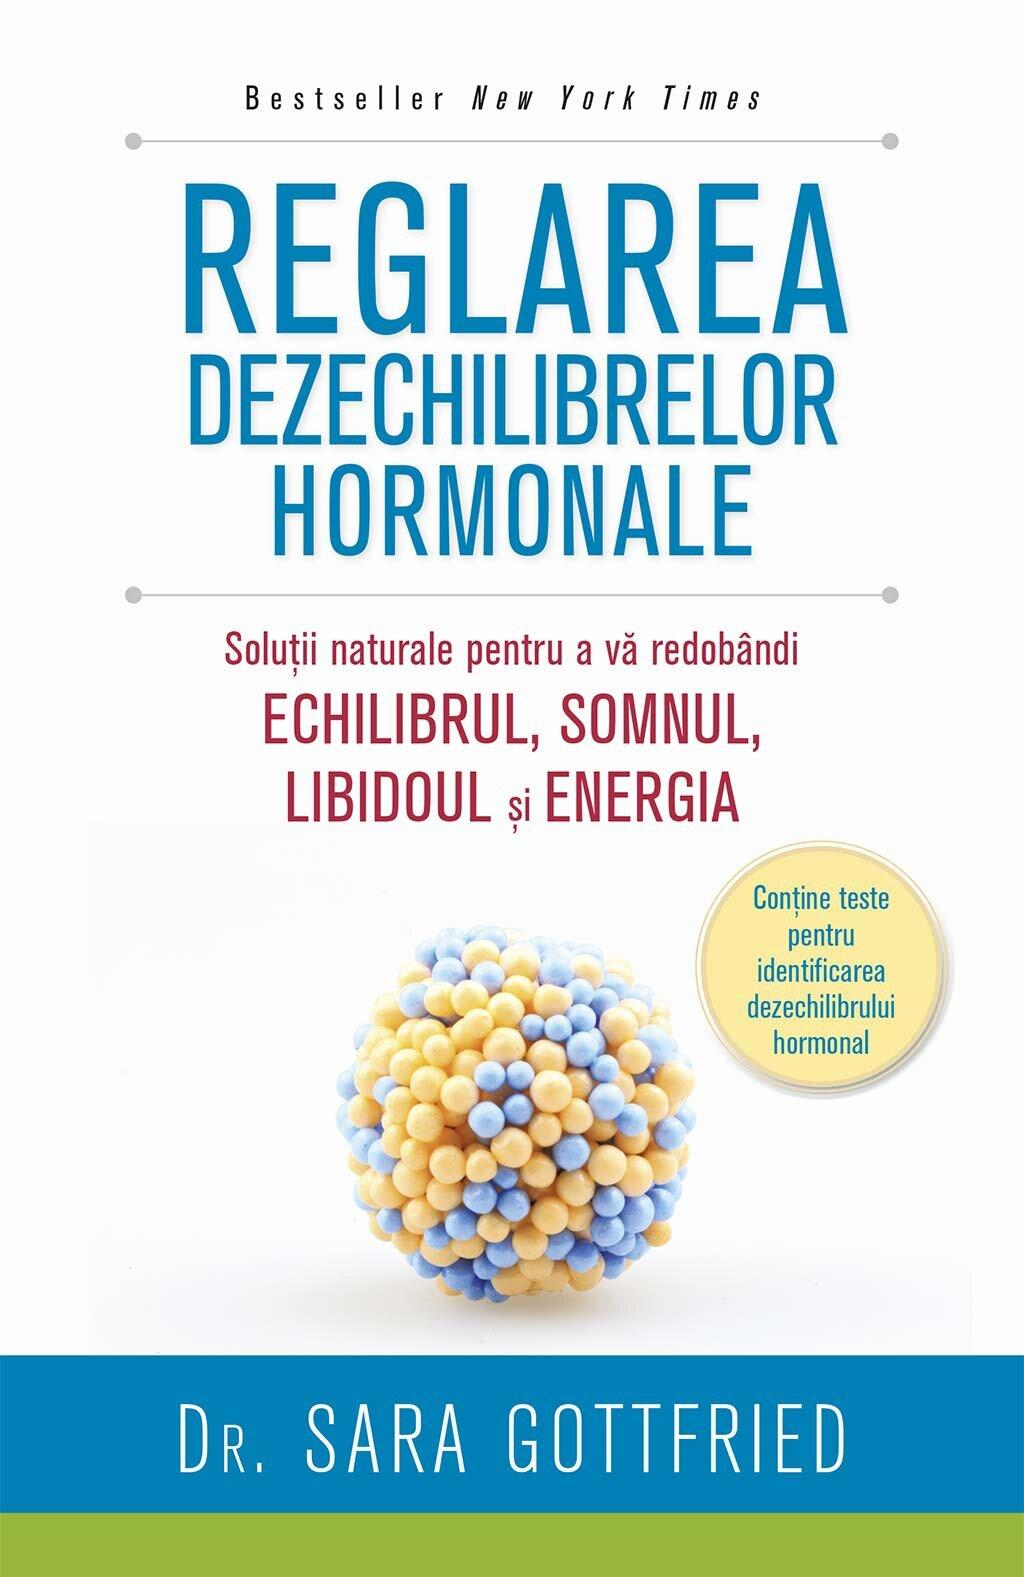 Reglarea dezechilibrelor hormonale. Solutii naturale pentru a va redobandi echilibrul, somnul, libidoul si energia (eBook)